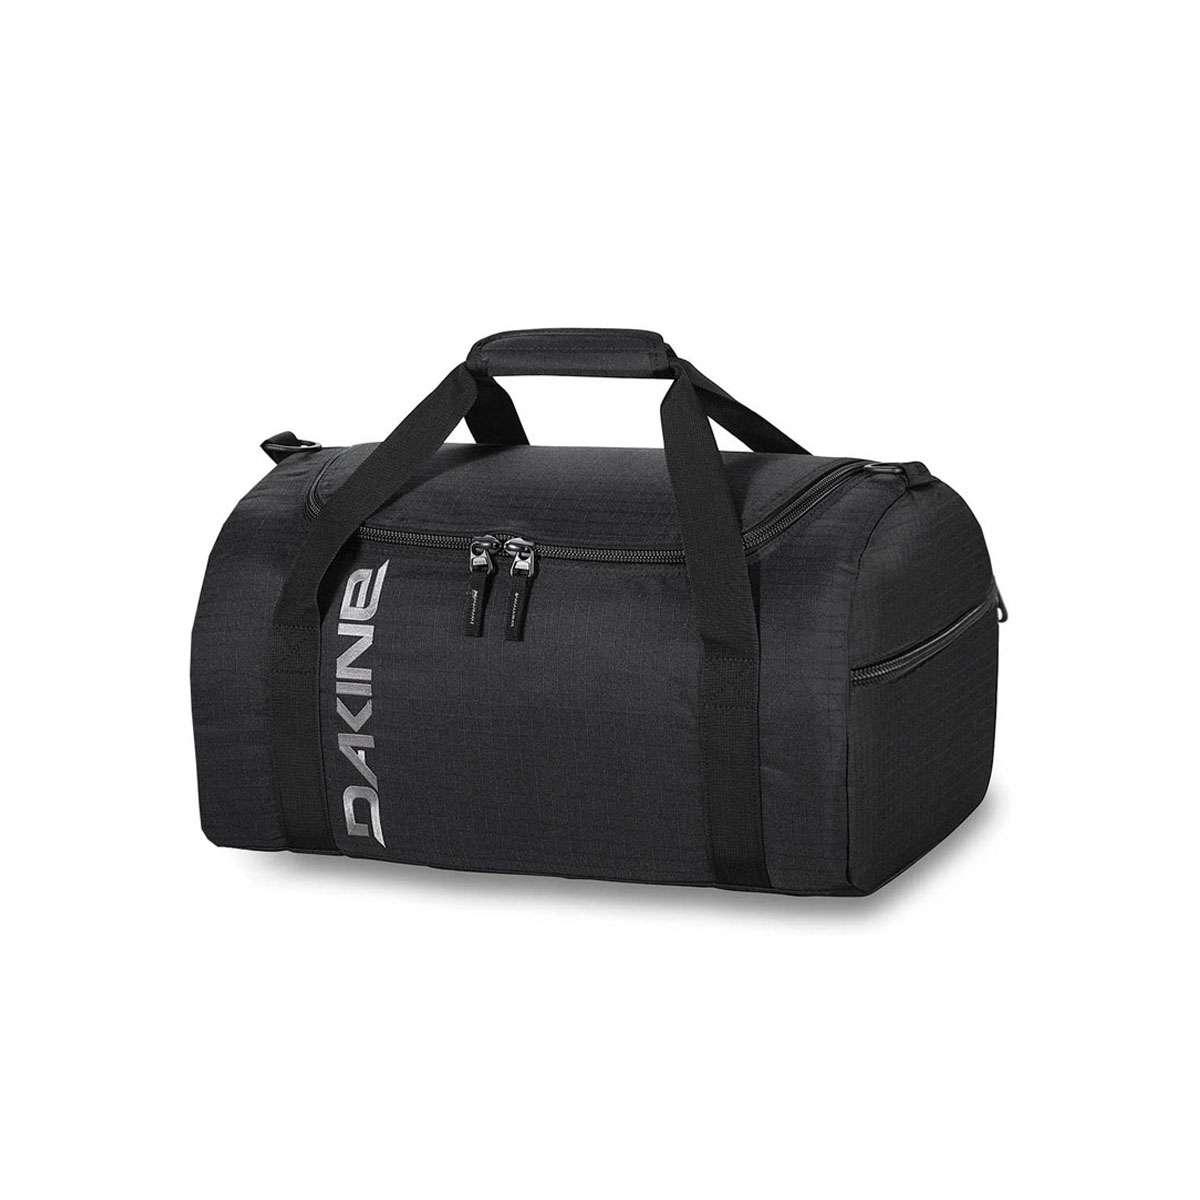 1121875e510be Dakine EQ Bag 23L Sporttasche Black